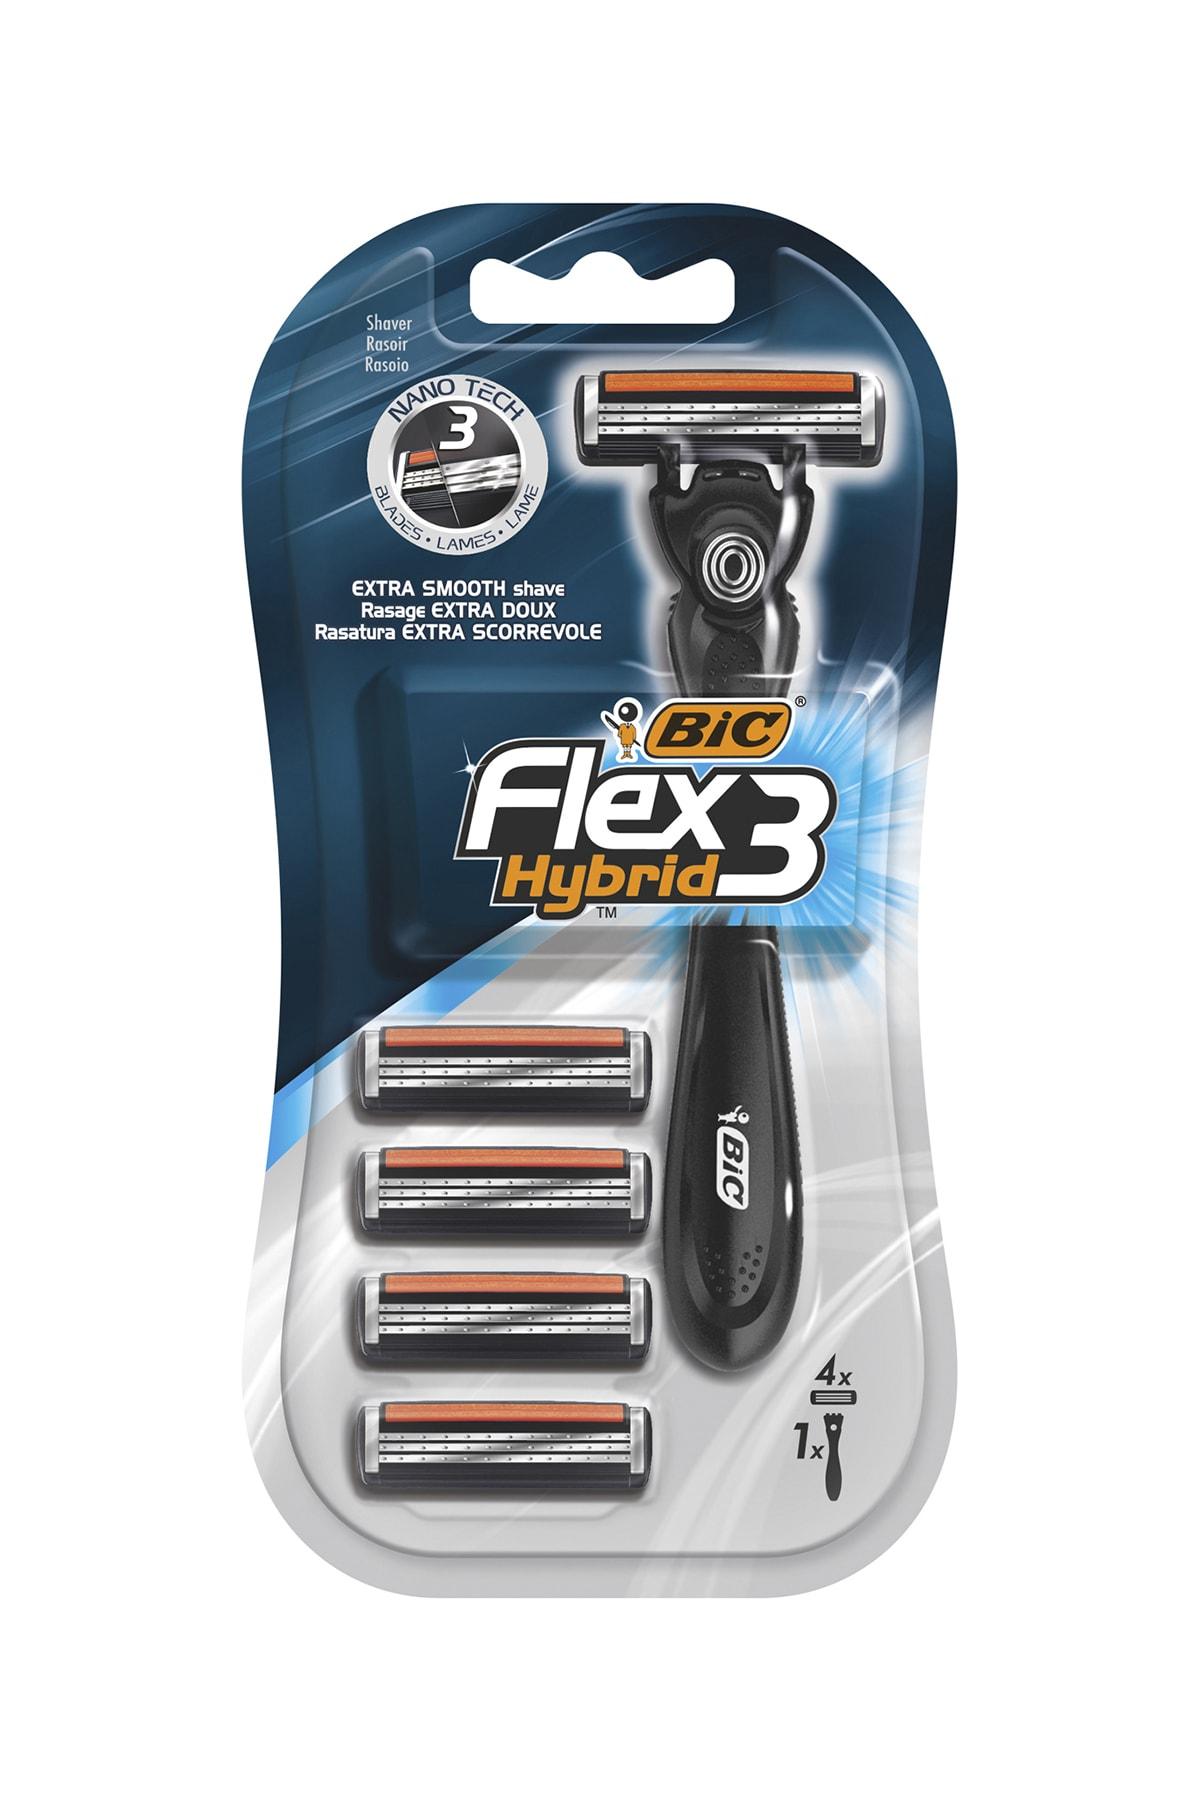 Bic Flex 3 Hybrid Tıraş Bıçağı 4 Kartuşlu (3 Bıçak) 1